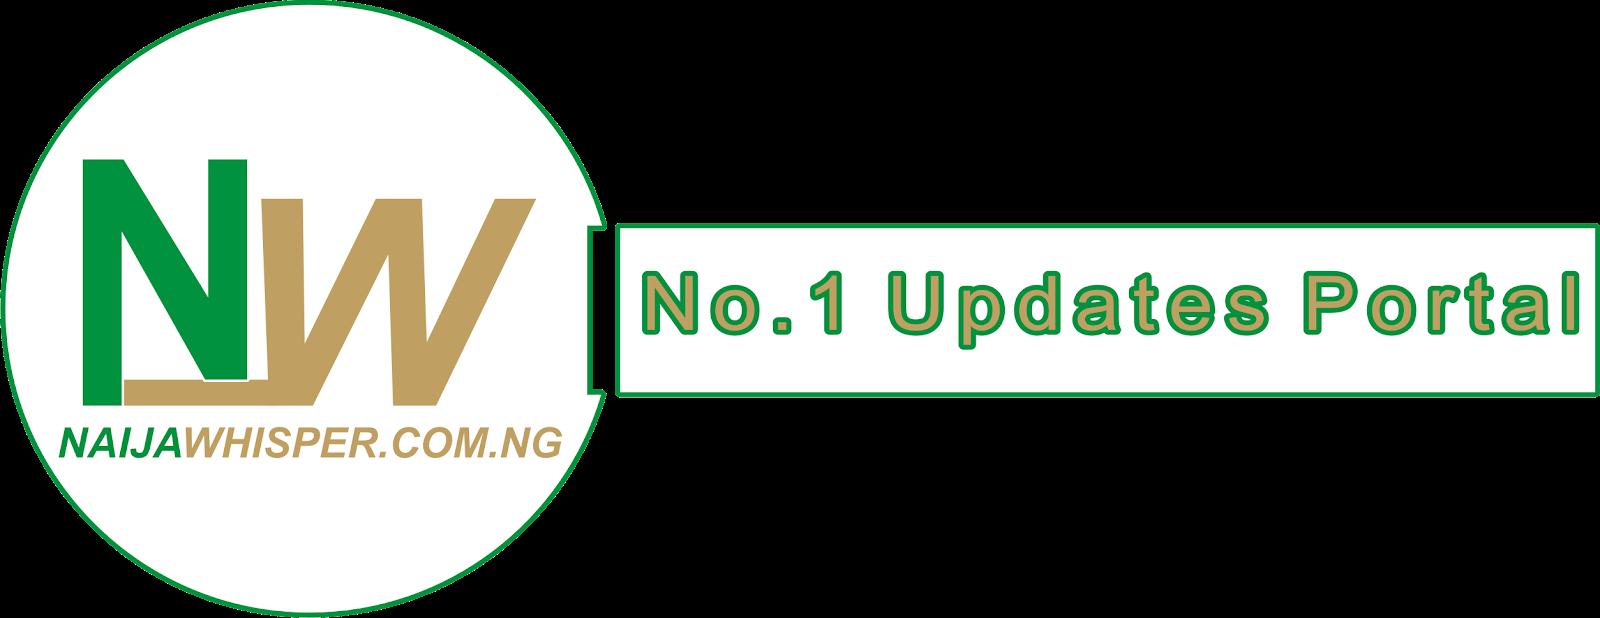 NaijaWhisper | No.1 Updates Portal